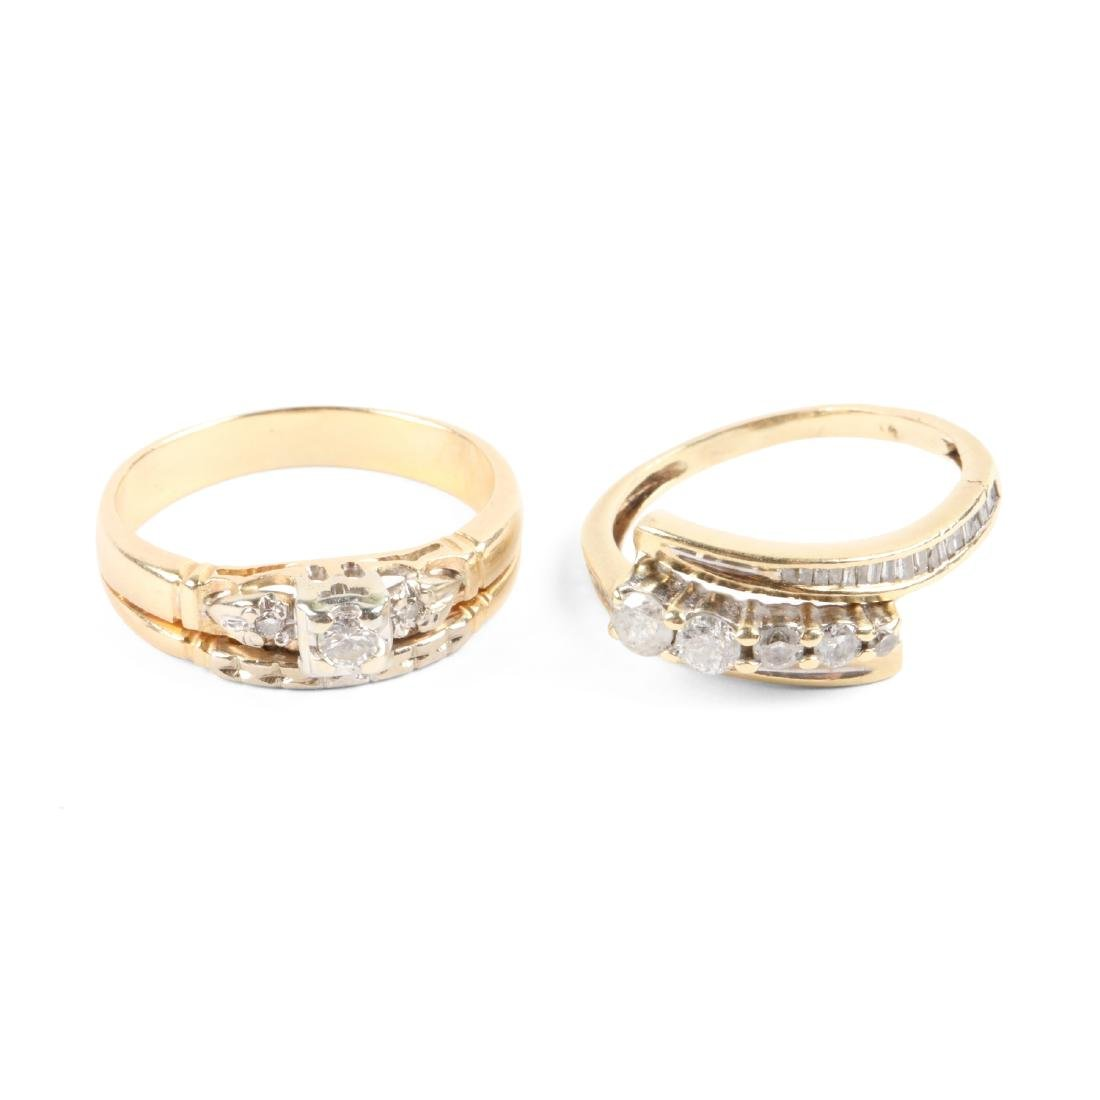 A Pair, 14K Gold & Diamond Rings